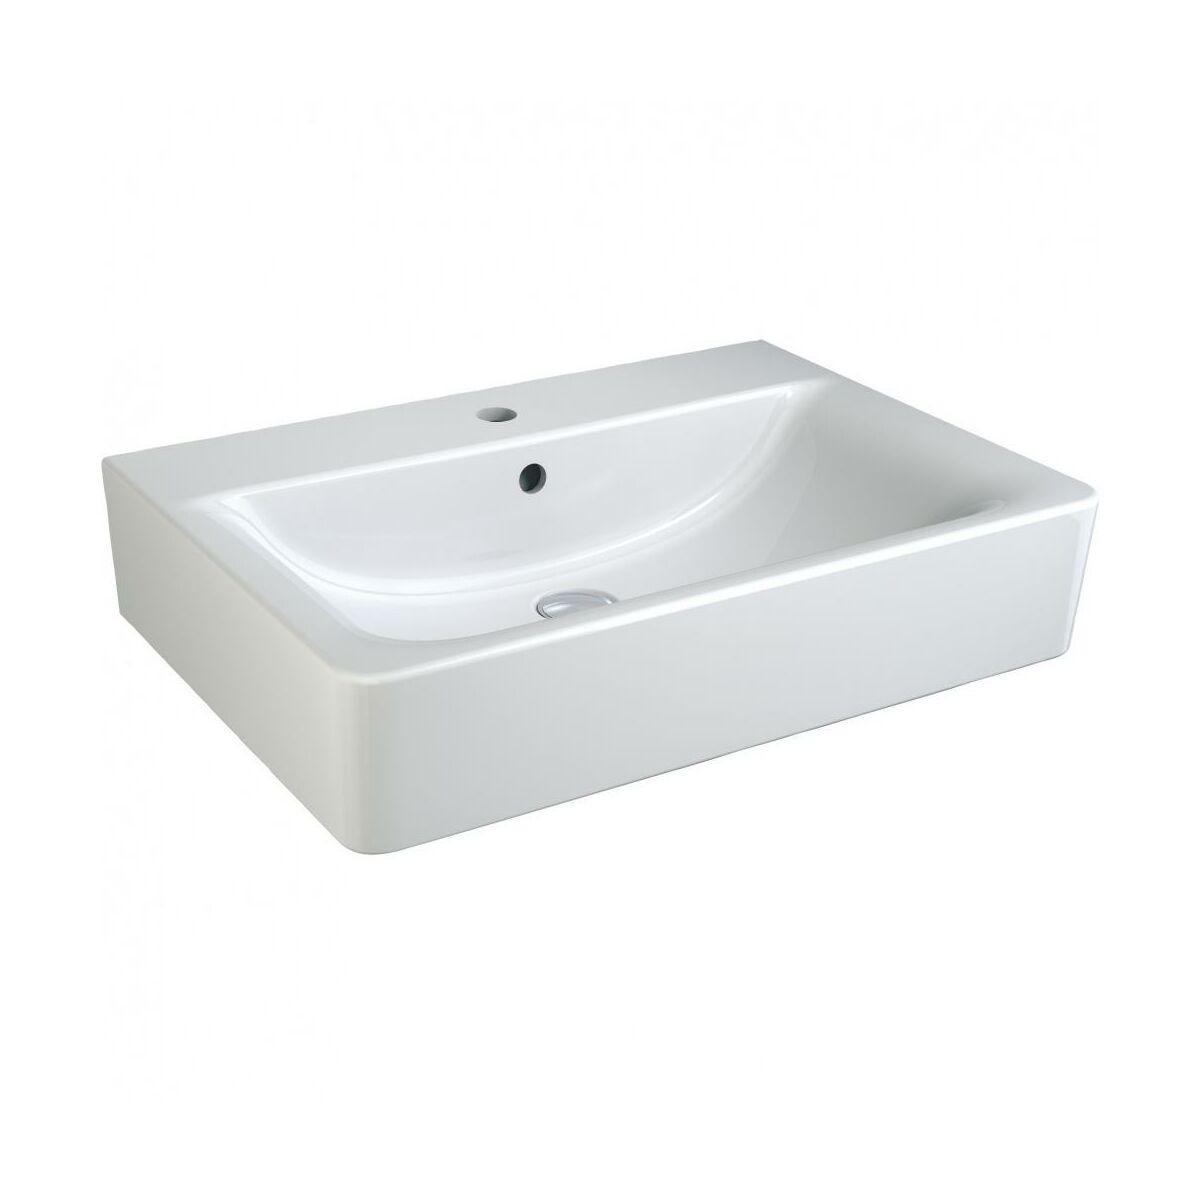 umywalka connect umywalki w atrakcyjnej cenie w sklepach leroy merlin. Black Bedroom Furniture Sets. Home Design Ideas